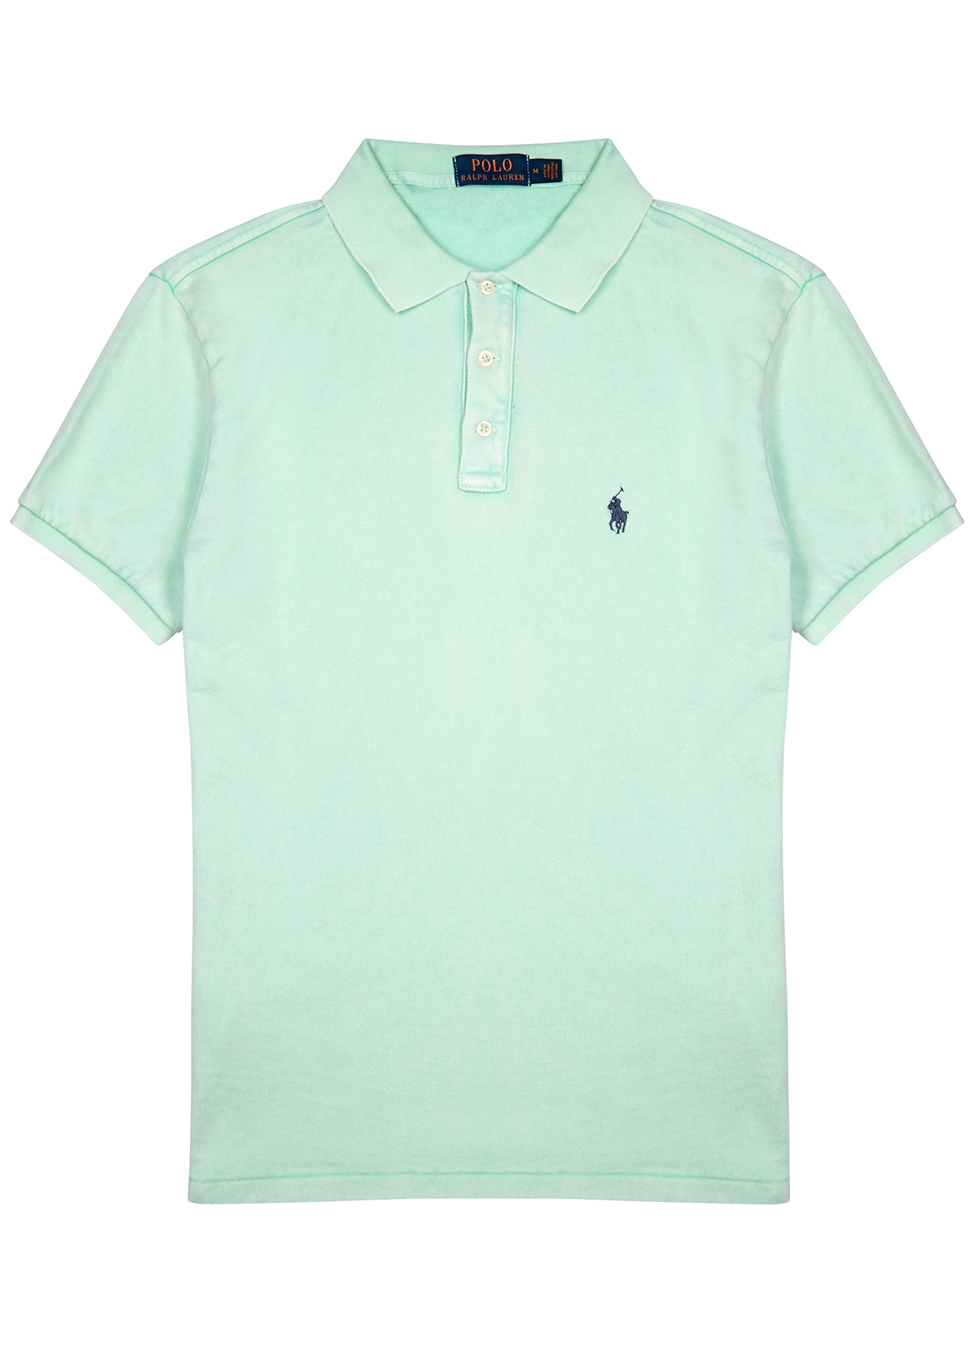 Mint Ralph Lauren Shirt Cotton Harvey Towelling Green Polo 4Lq5j3RA